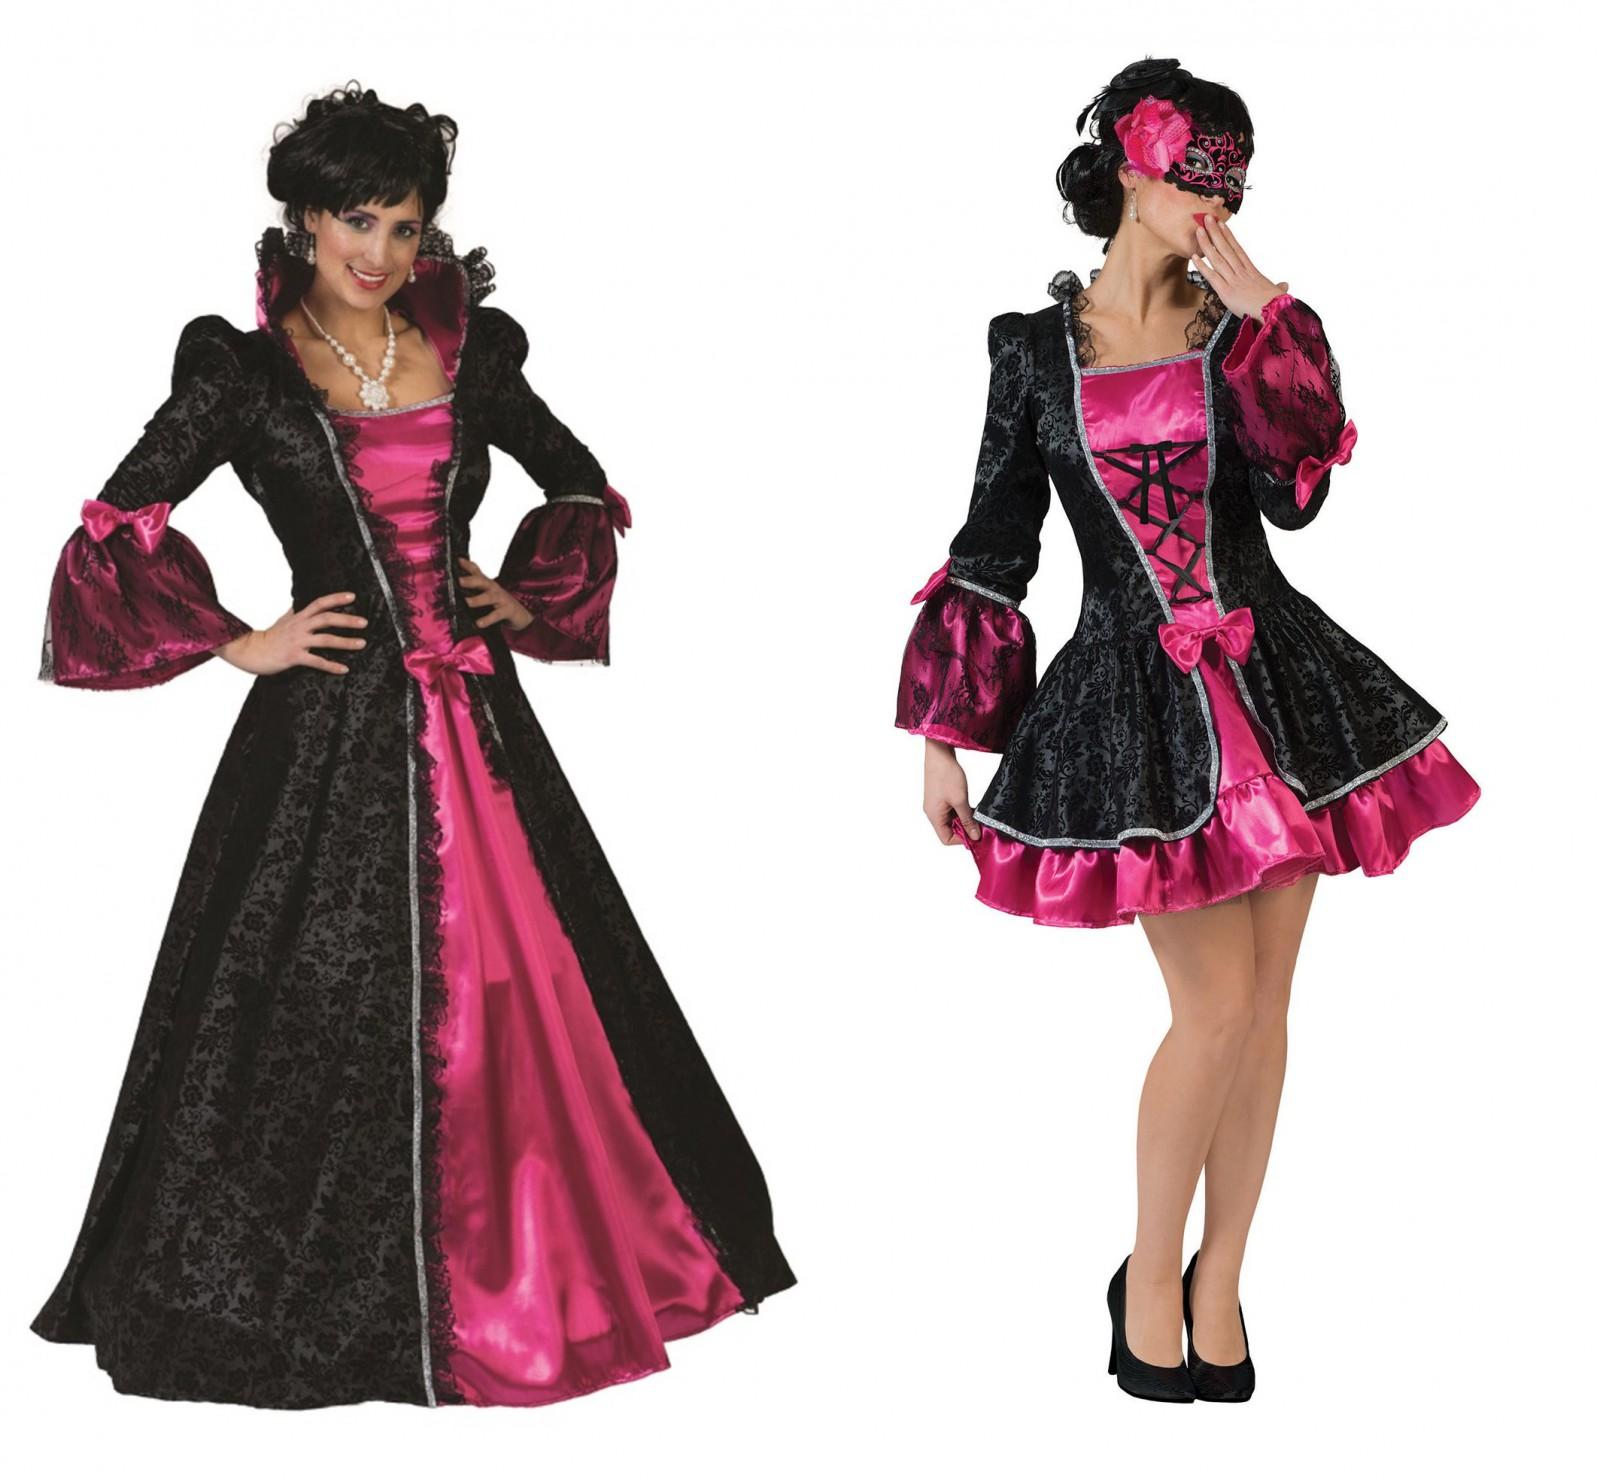 exclusives kleid kost m barock rokoko barockkleid schwarz pink maskenball kost me co. Black Bedroom Furniture Sets. Home Design Ideas